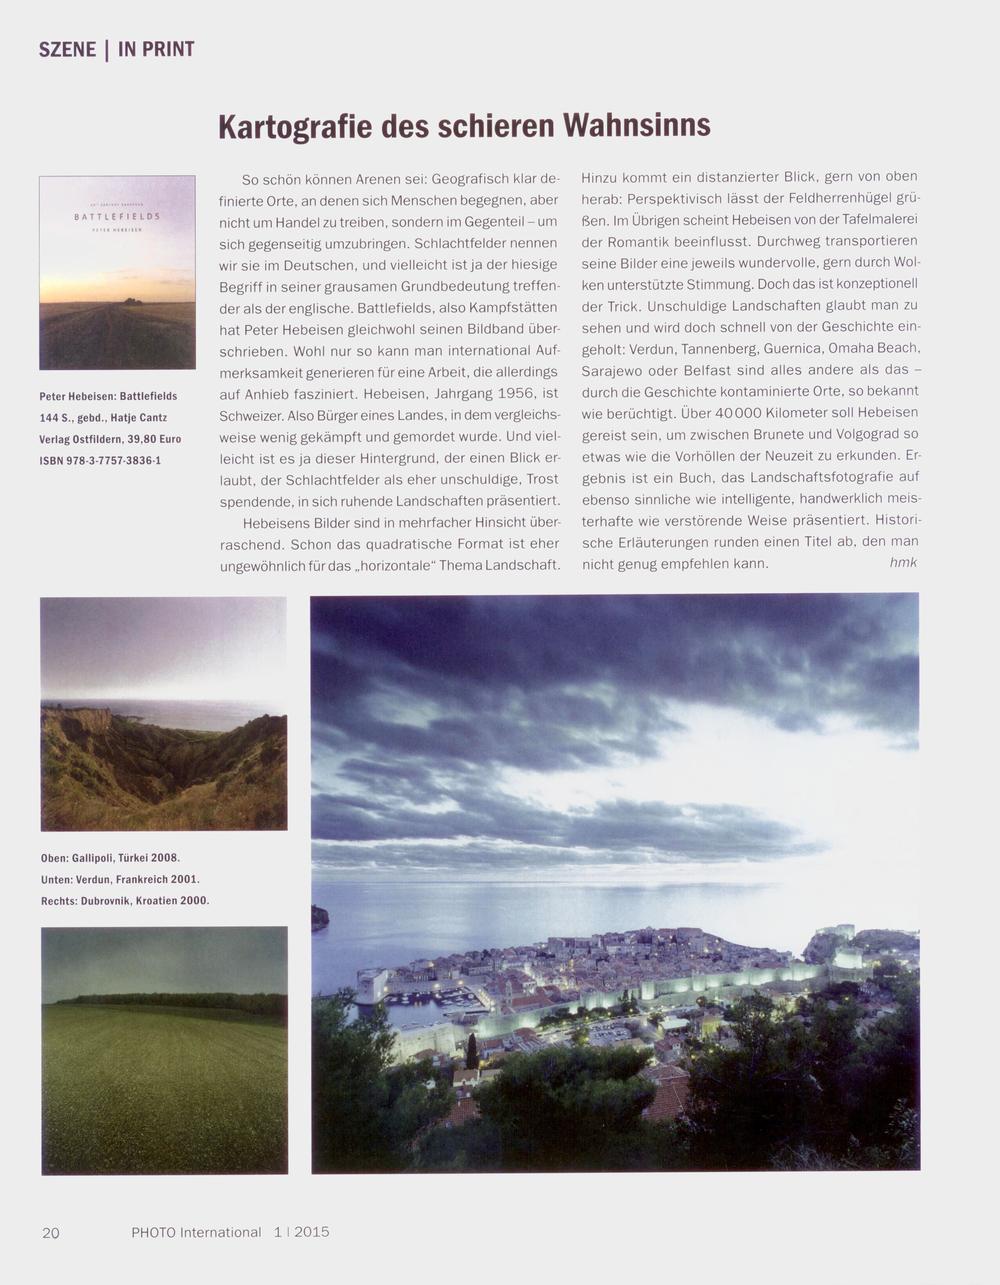 Press_Photo_Int Kopie.jpg